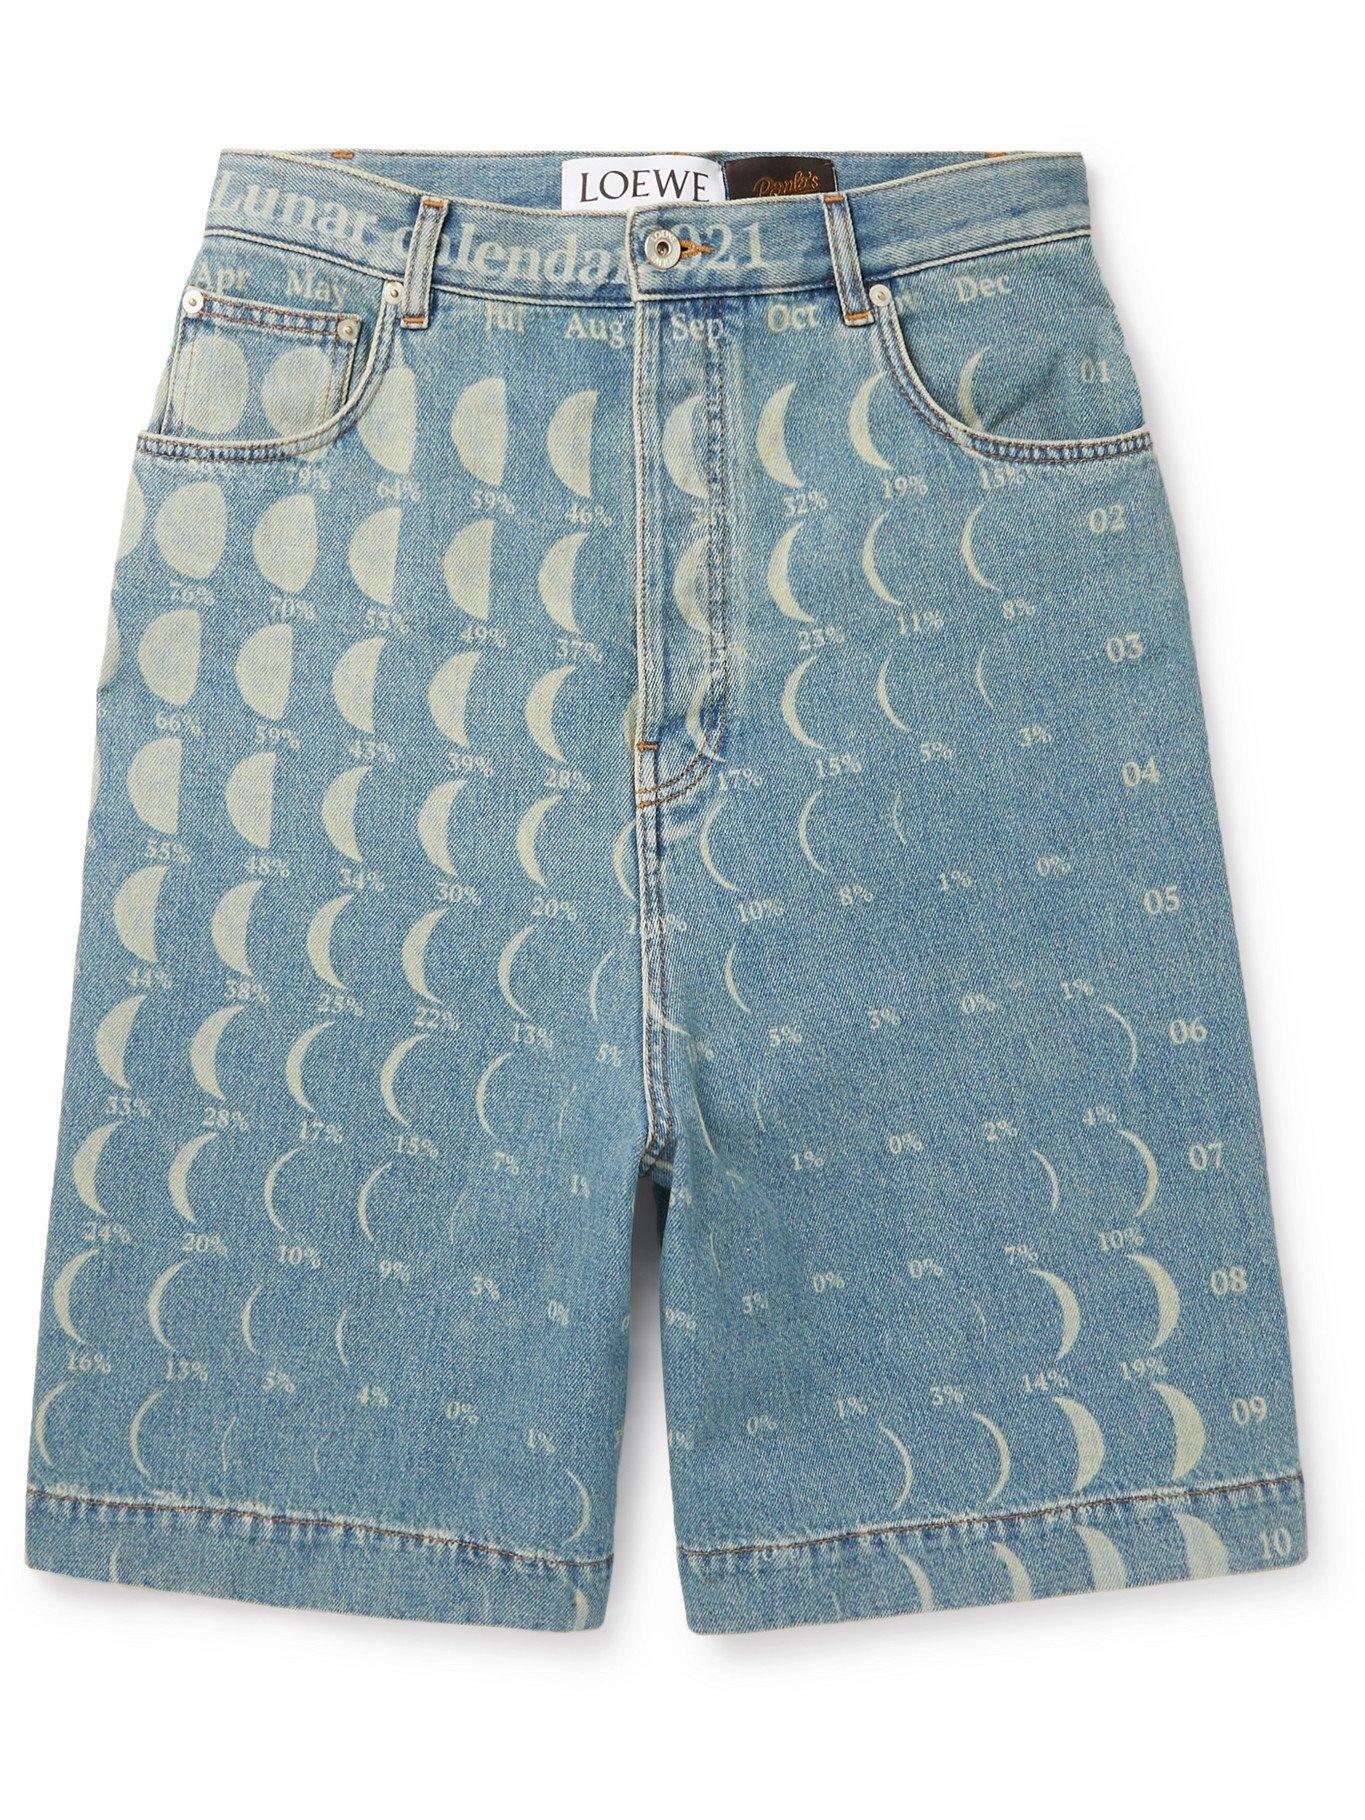 Photo: LOEWE - Paula's Ibiza Printed Denim Shorts - Blue